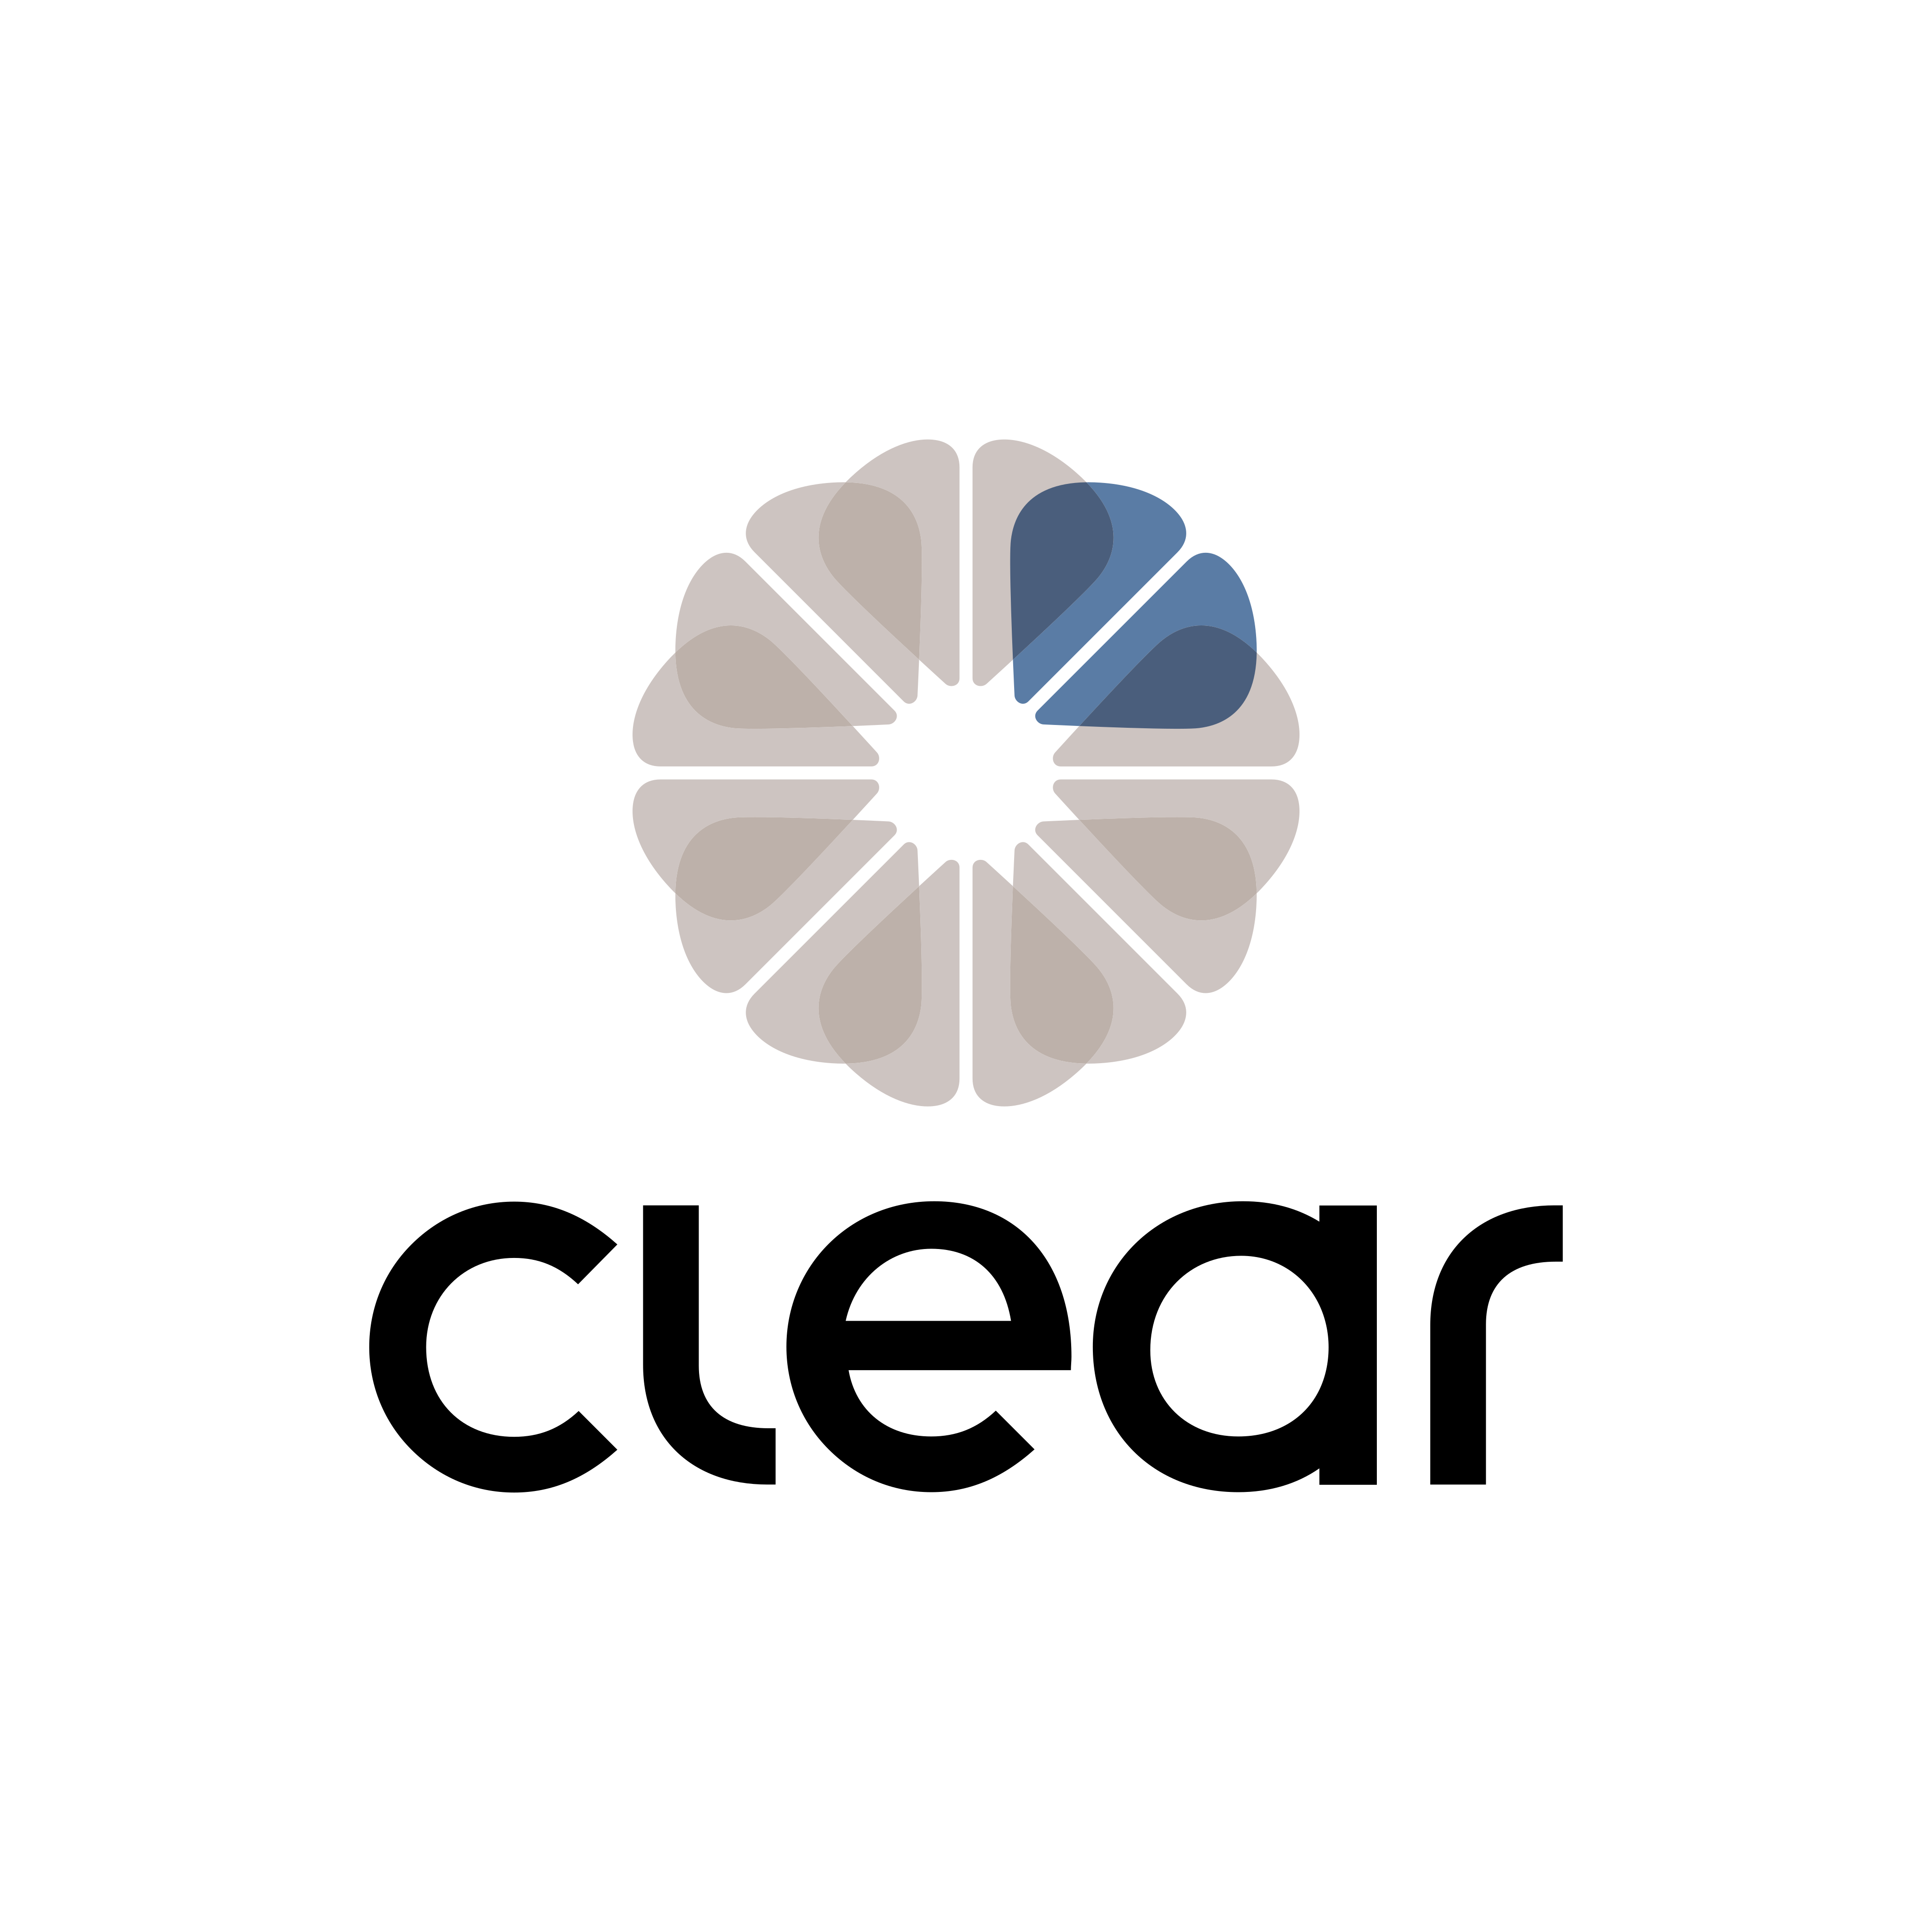 clear corretora logo 0 - Clear Corretora Logo